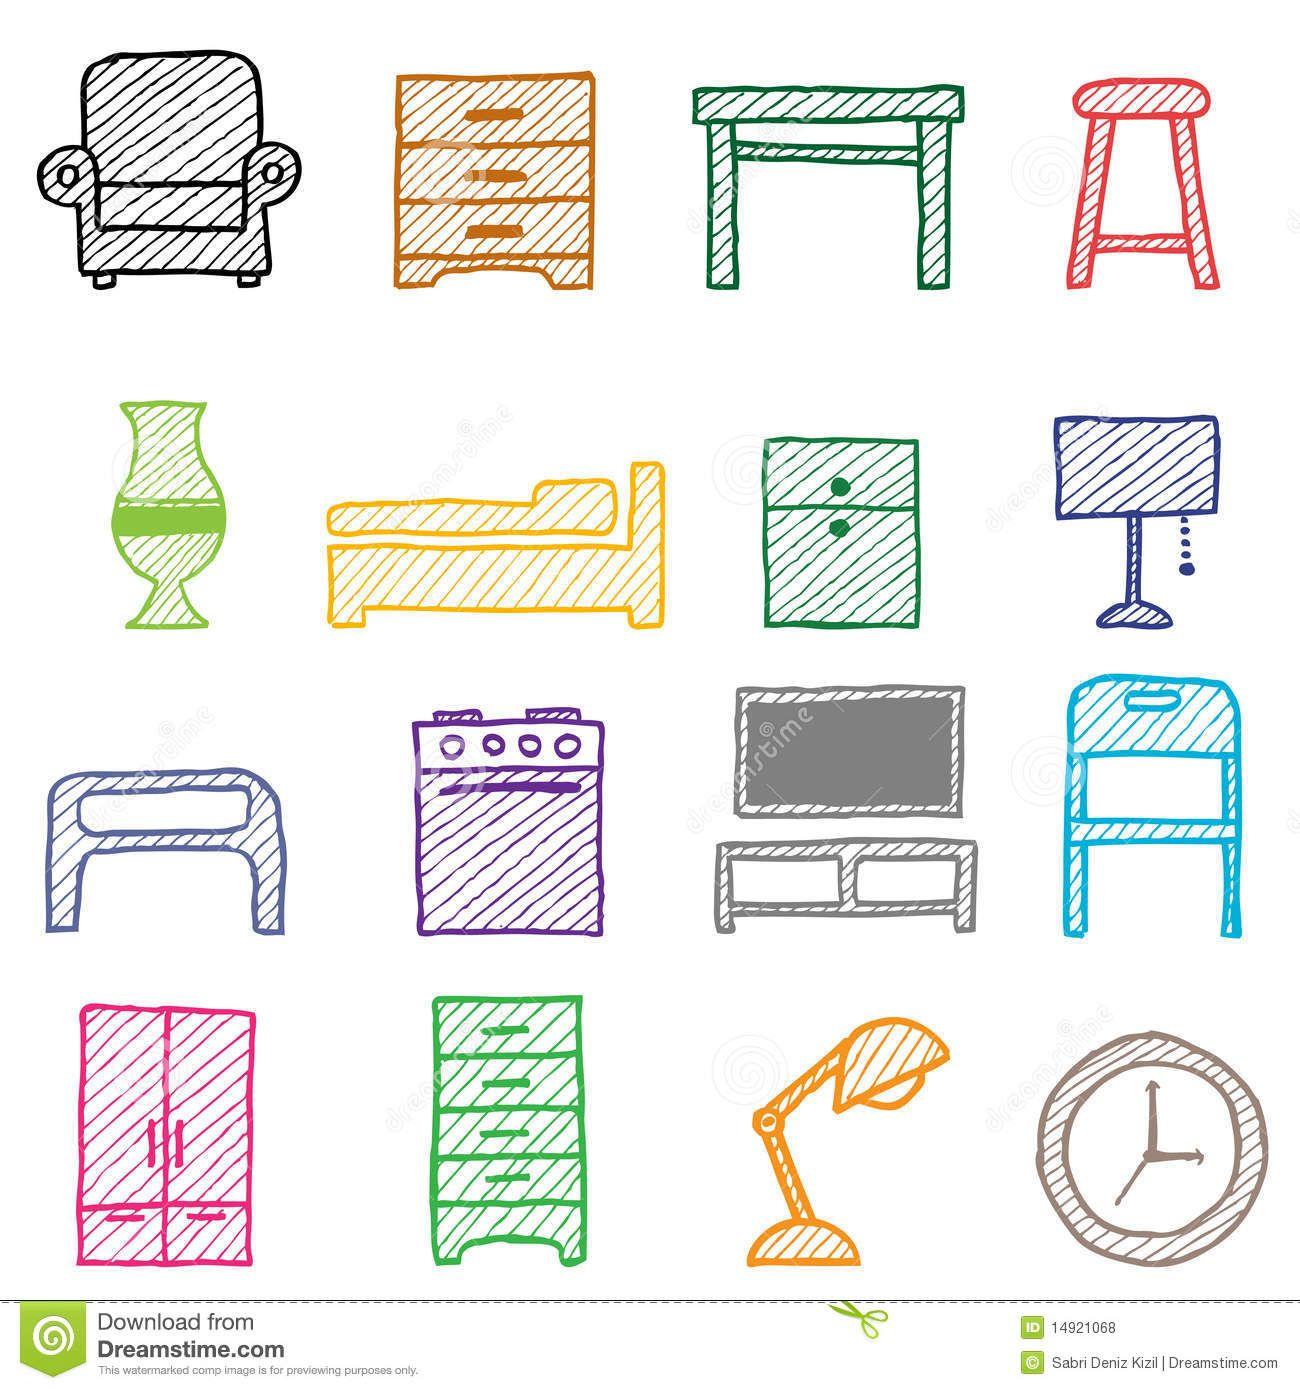 office chair dwg joya rocking review drawing furniture google search art